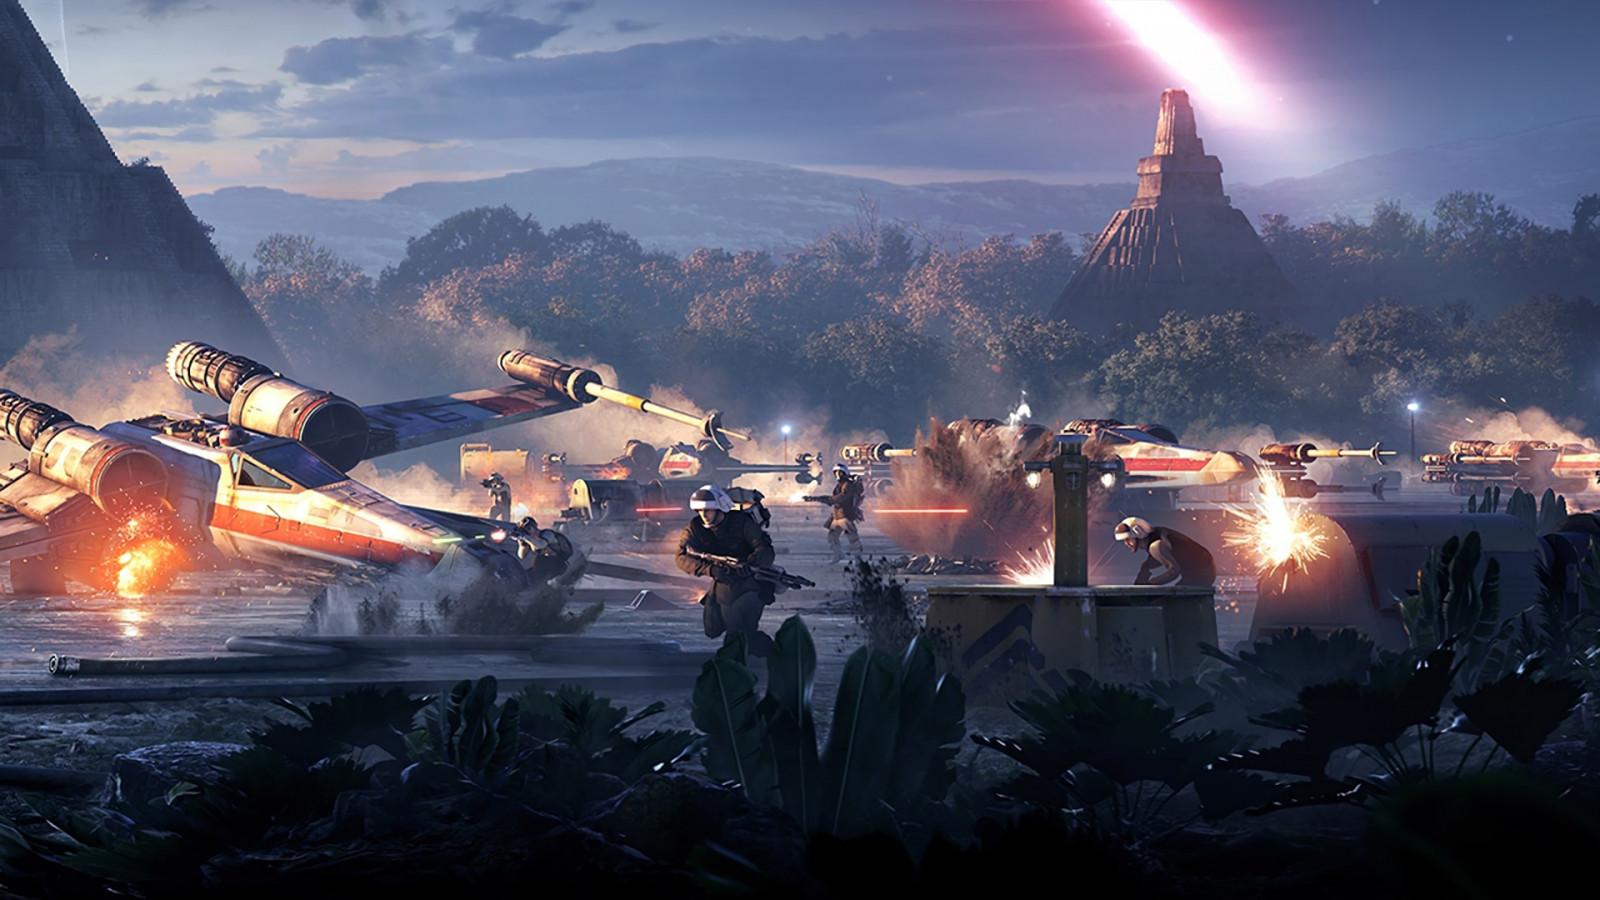 Wallpaper : Star Wars Battlefront II, Star Wars, Video